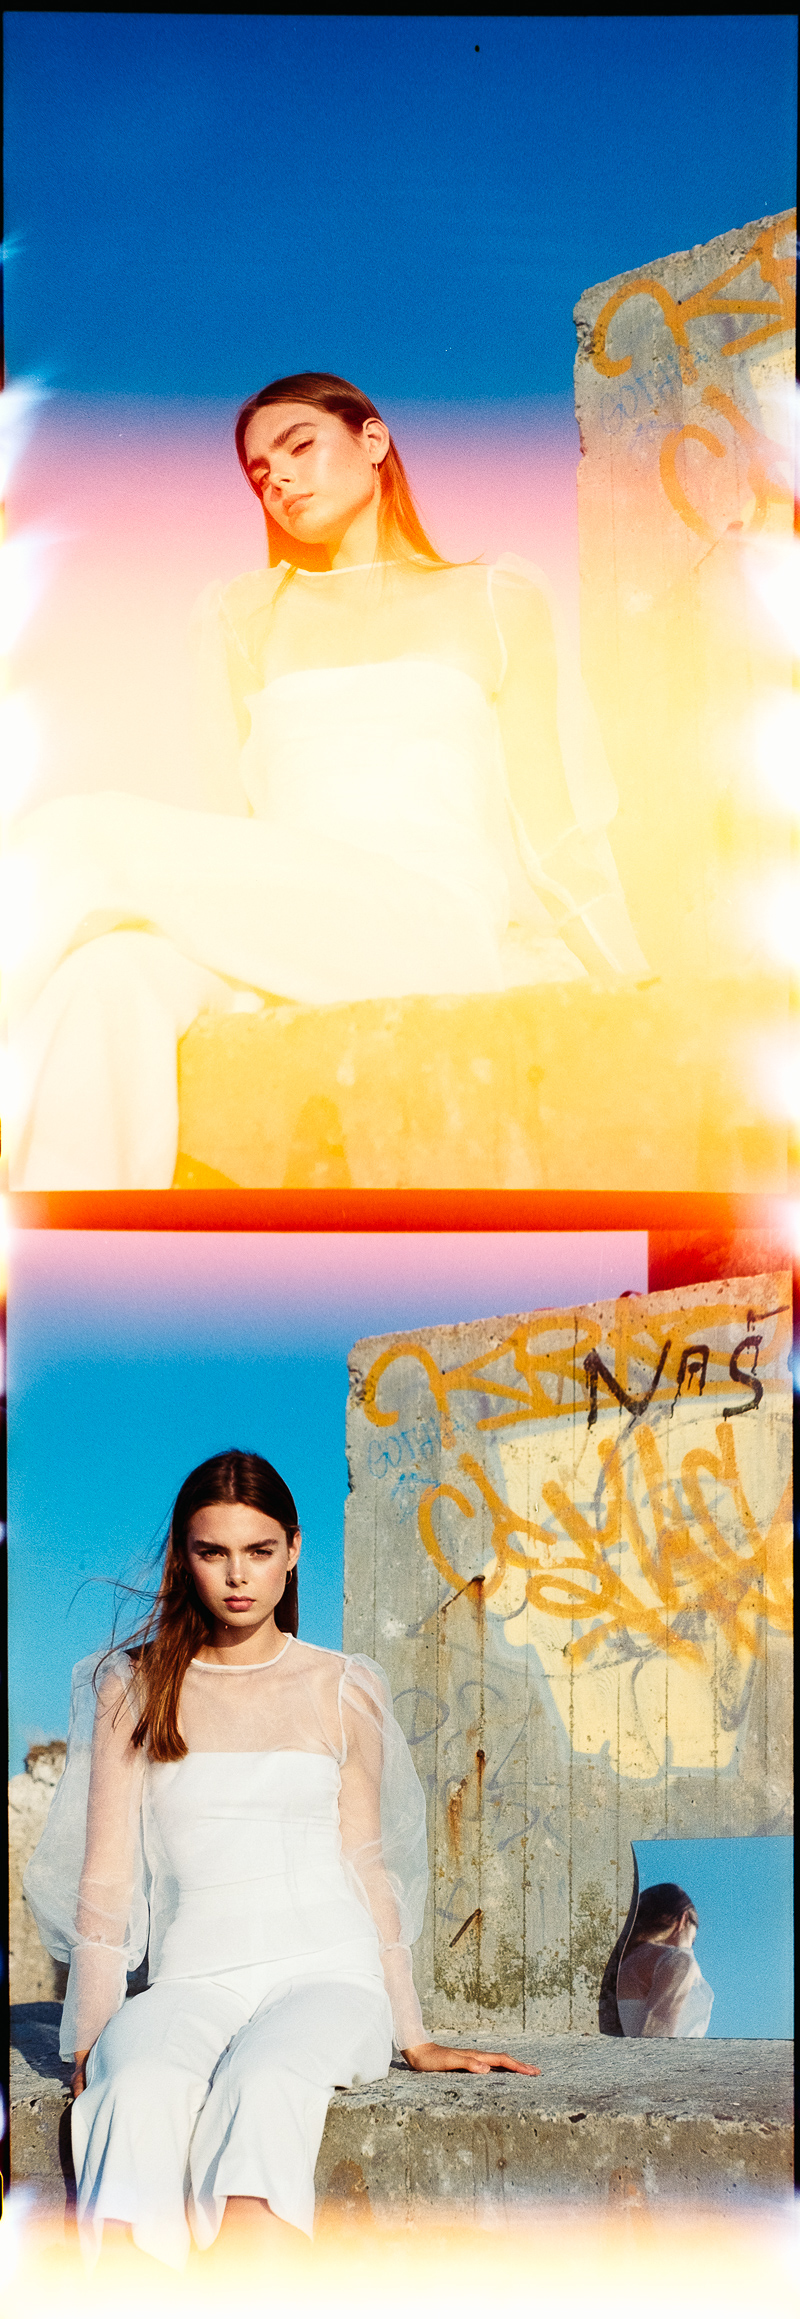 editorial, film photography, kodak gold, almjohannes, johannes alm, fashion photography, 35mm, minolta x500